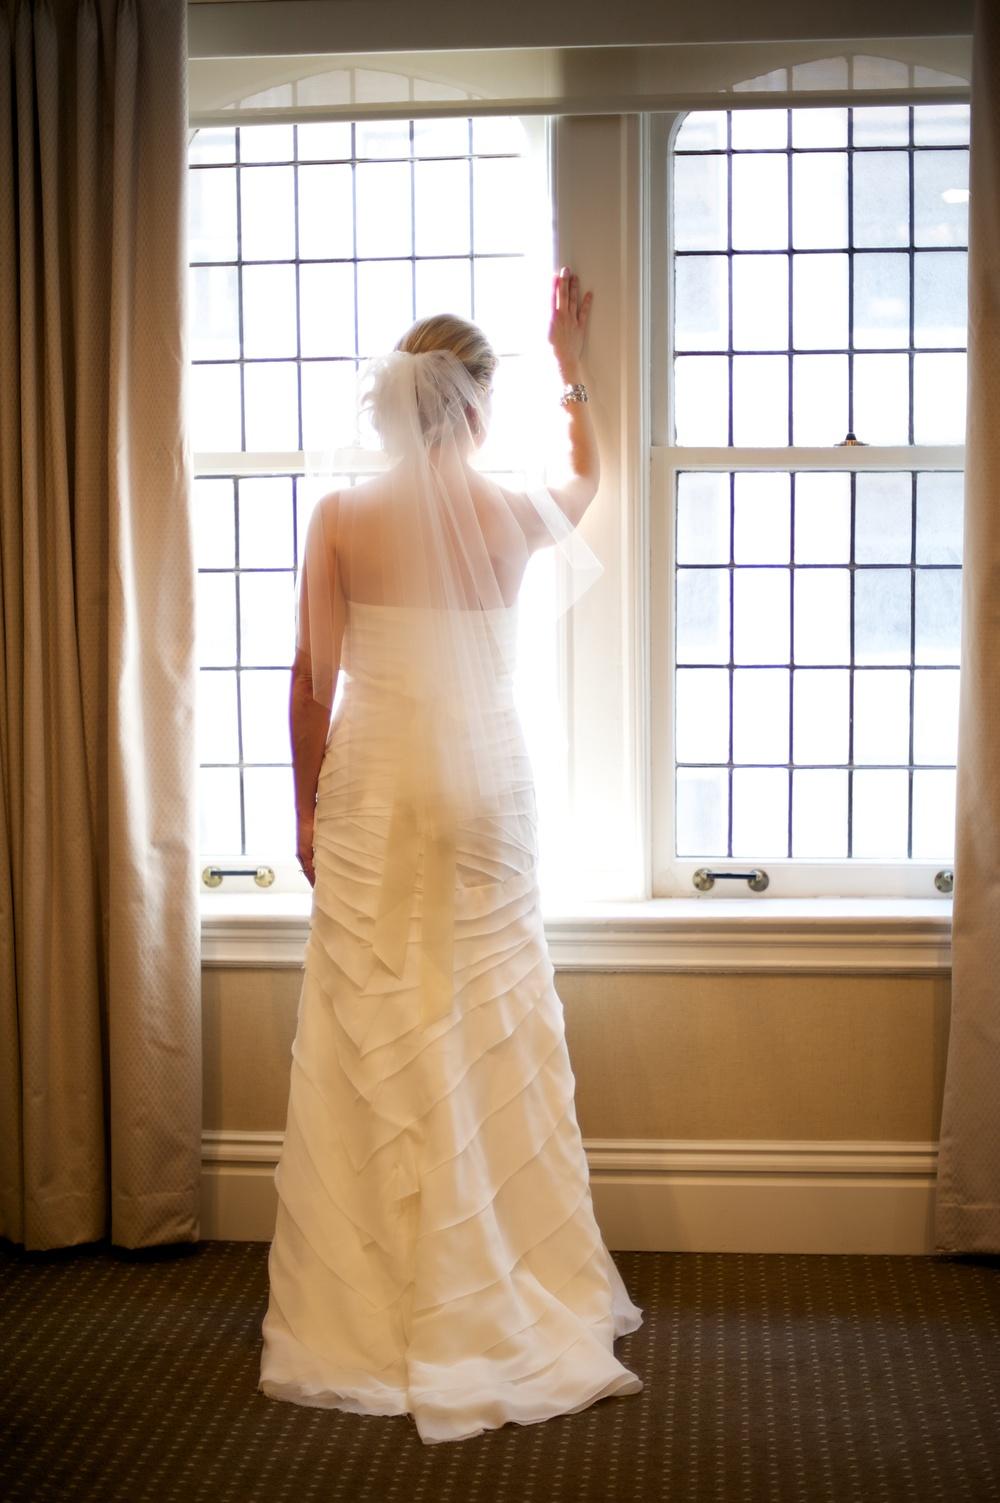 2014.03.21_Lenear-Peruchini_Wedding  2015.03.21_Lenear-Peruchini_Wedding